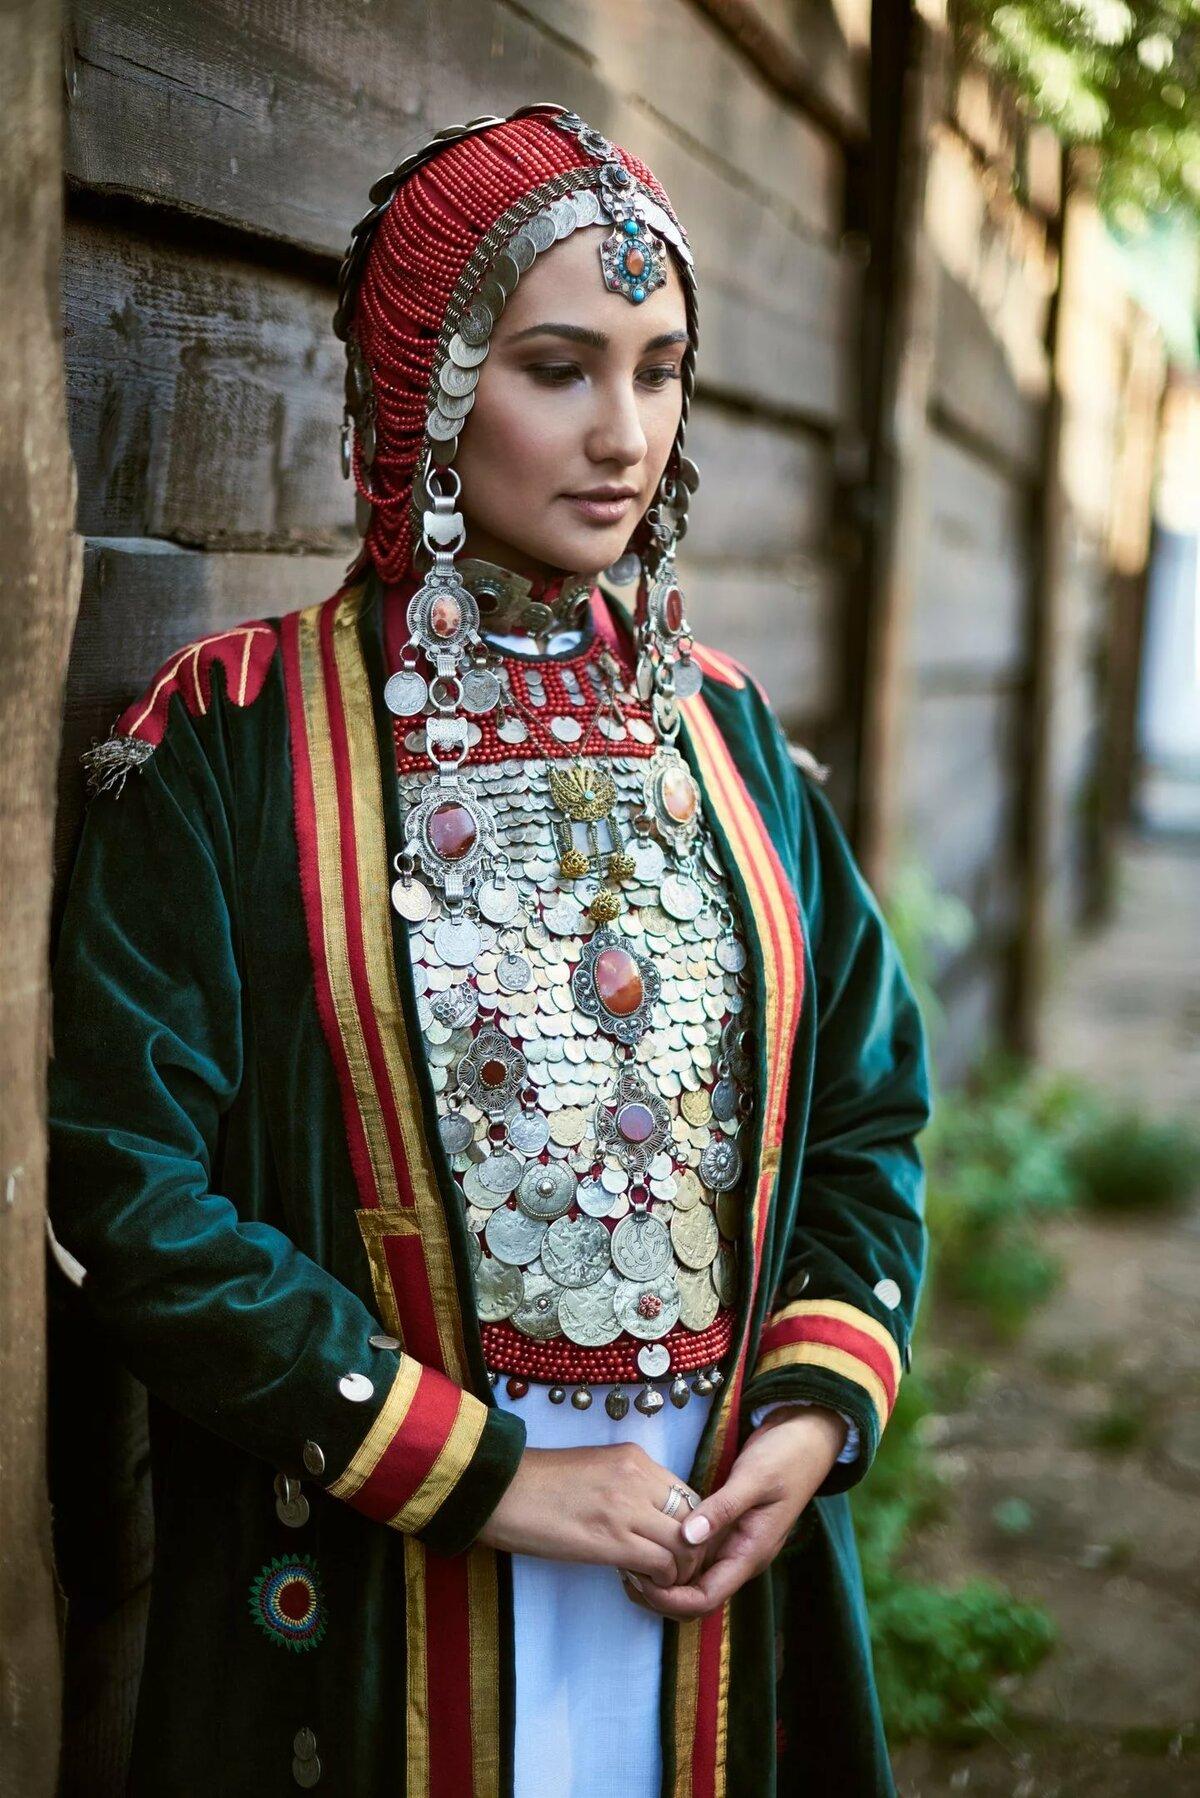 башкирский народный костюм картинки трафареты